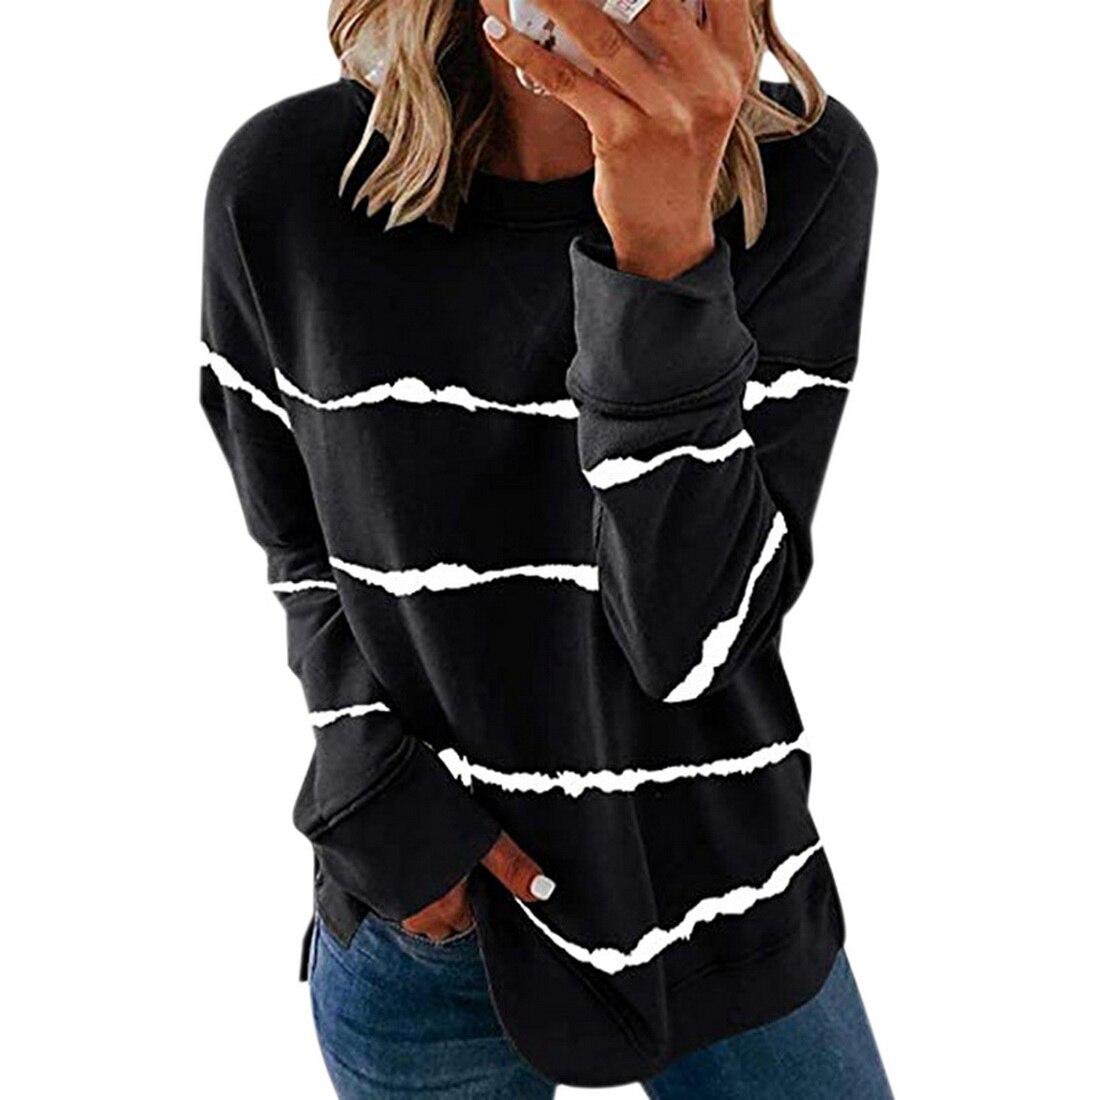 Striped Print Long Sleeve Black Hoodies Women 2020 Big Size 5XL Casual Tee Black Autumn Top O-Neck Loose Sport Ladies Hoodies 13